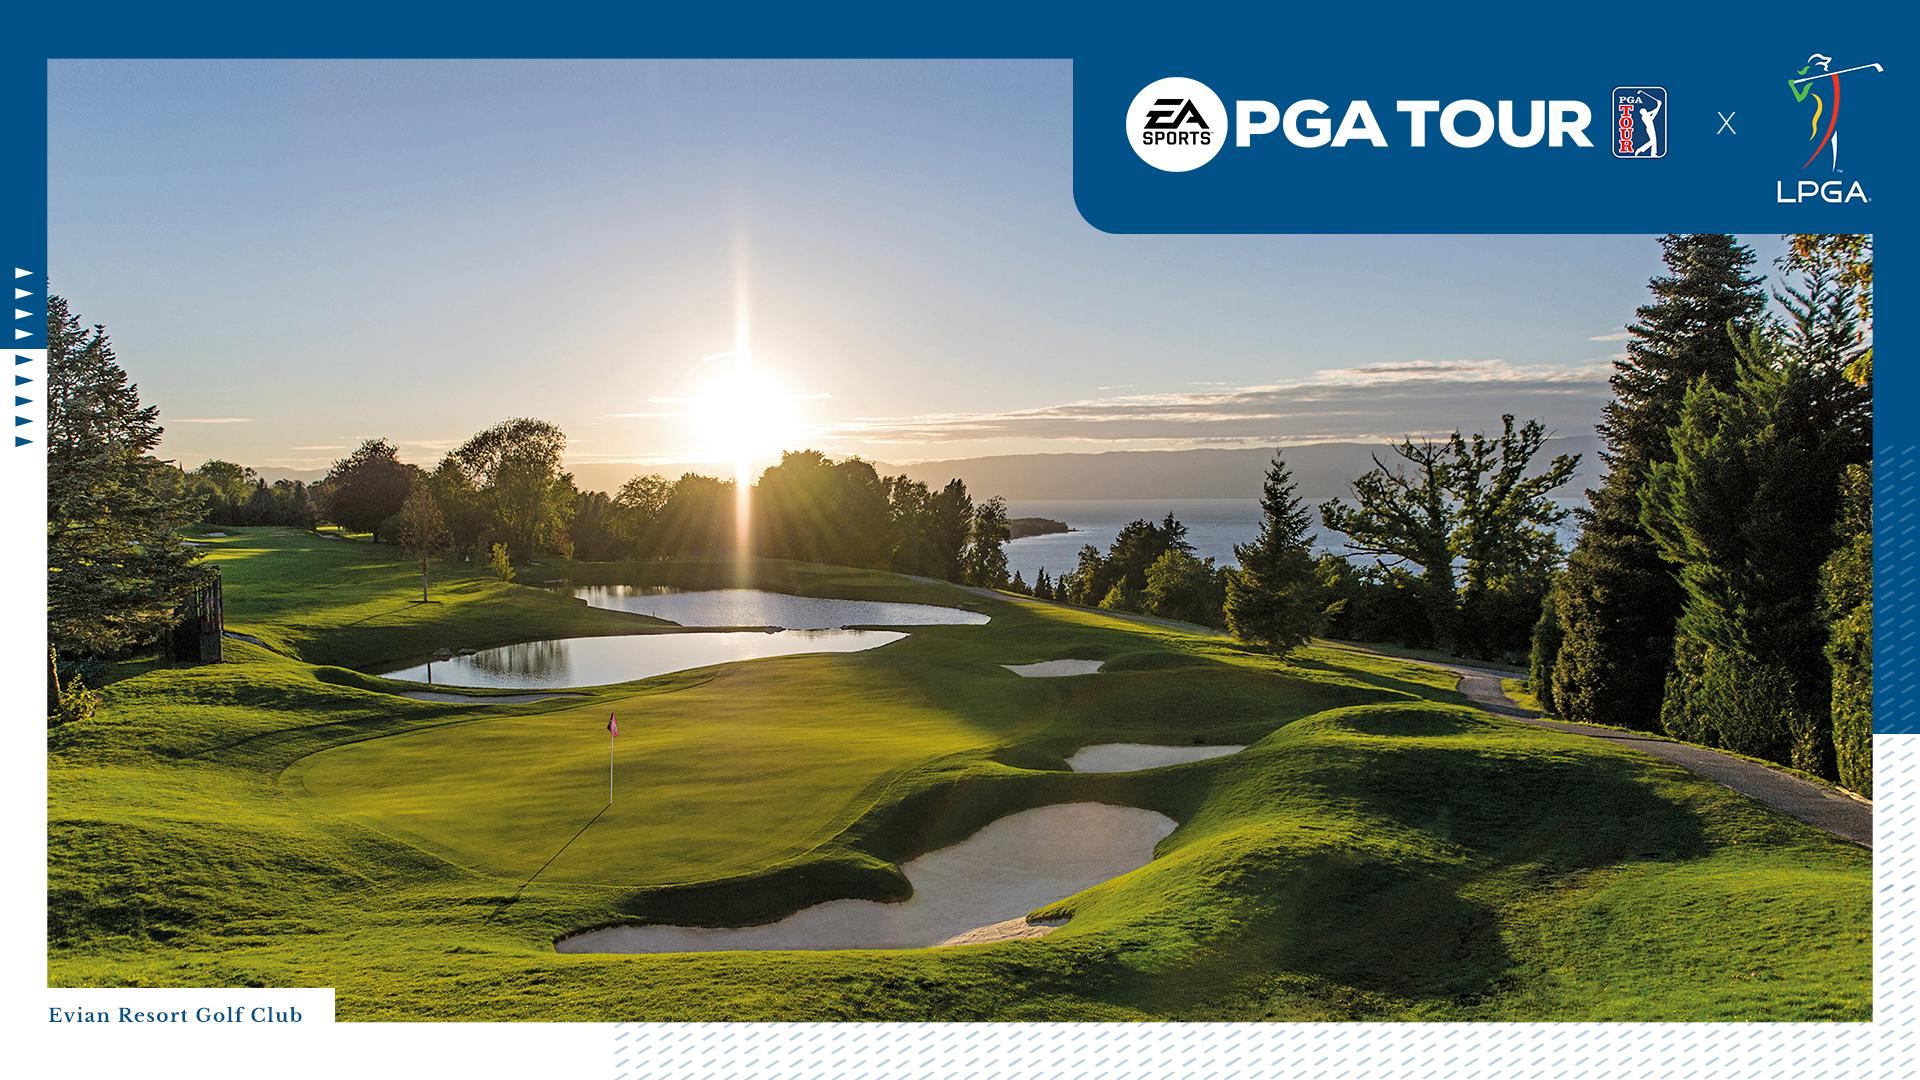 Evian Resort Golf Club in Évian-les-Bains in EA Sports PGA Tour LPGA